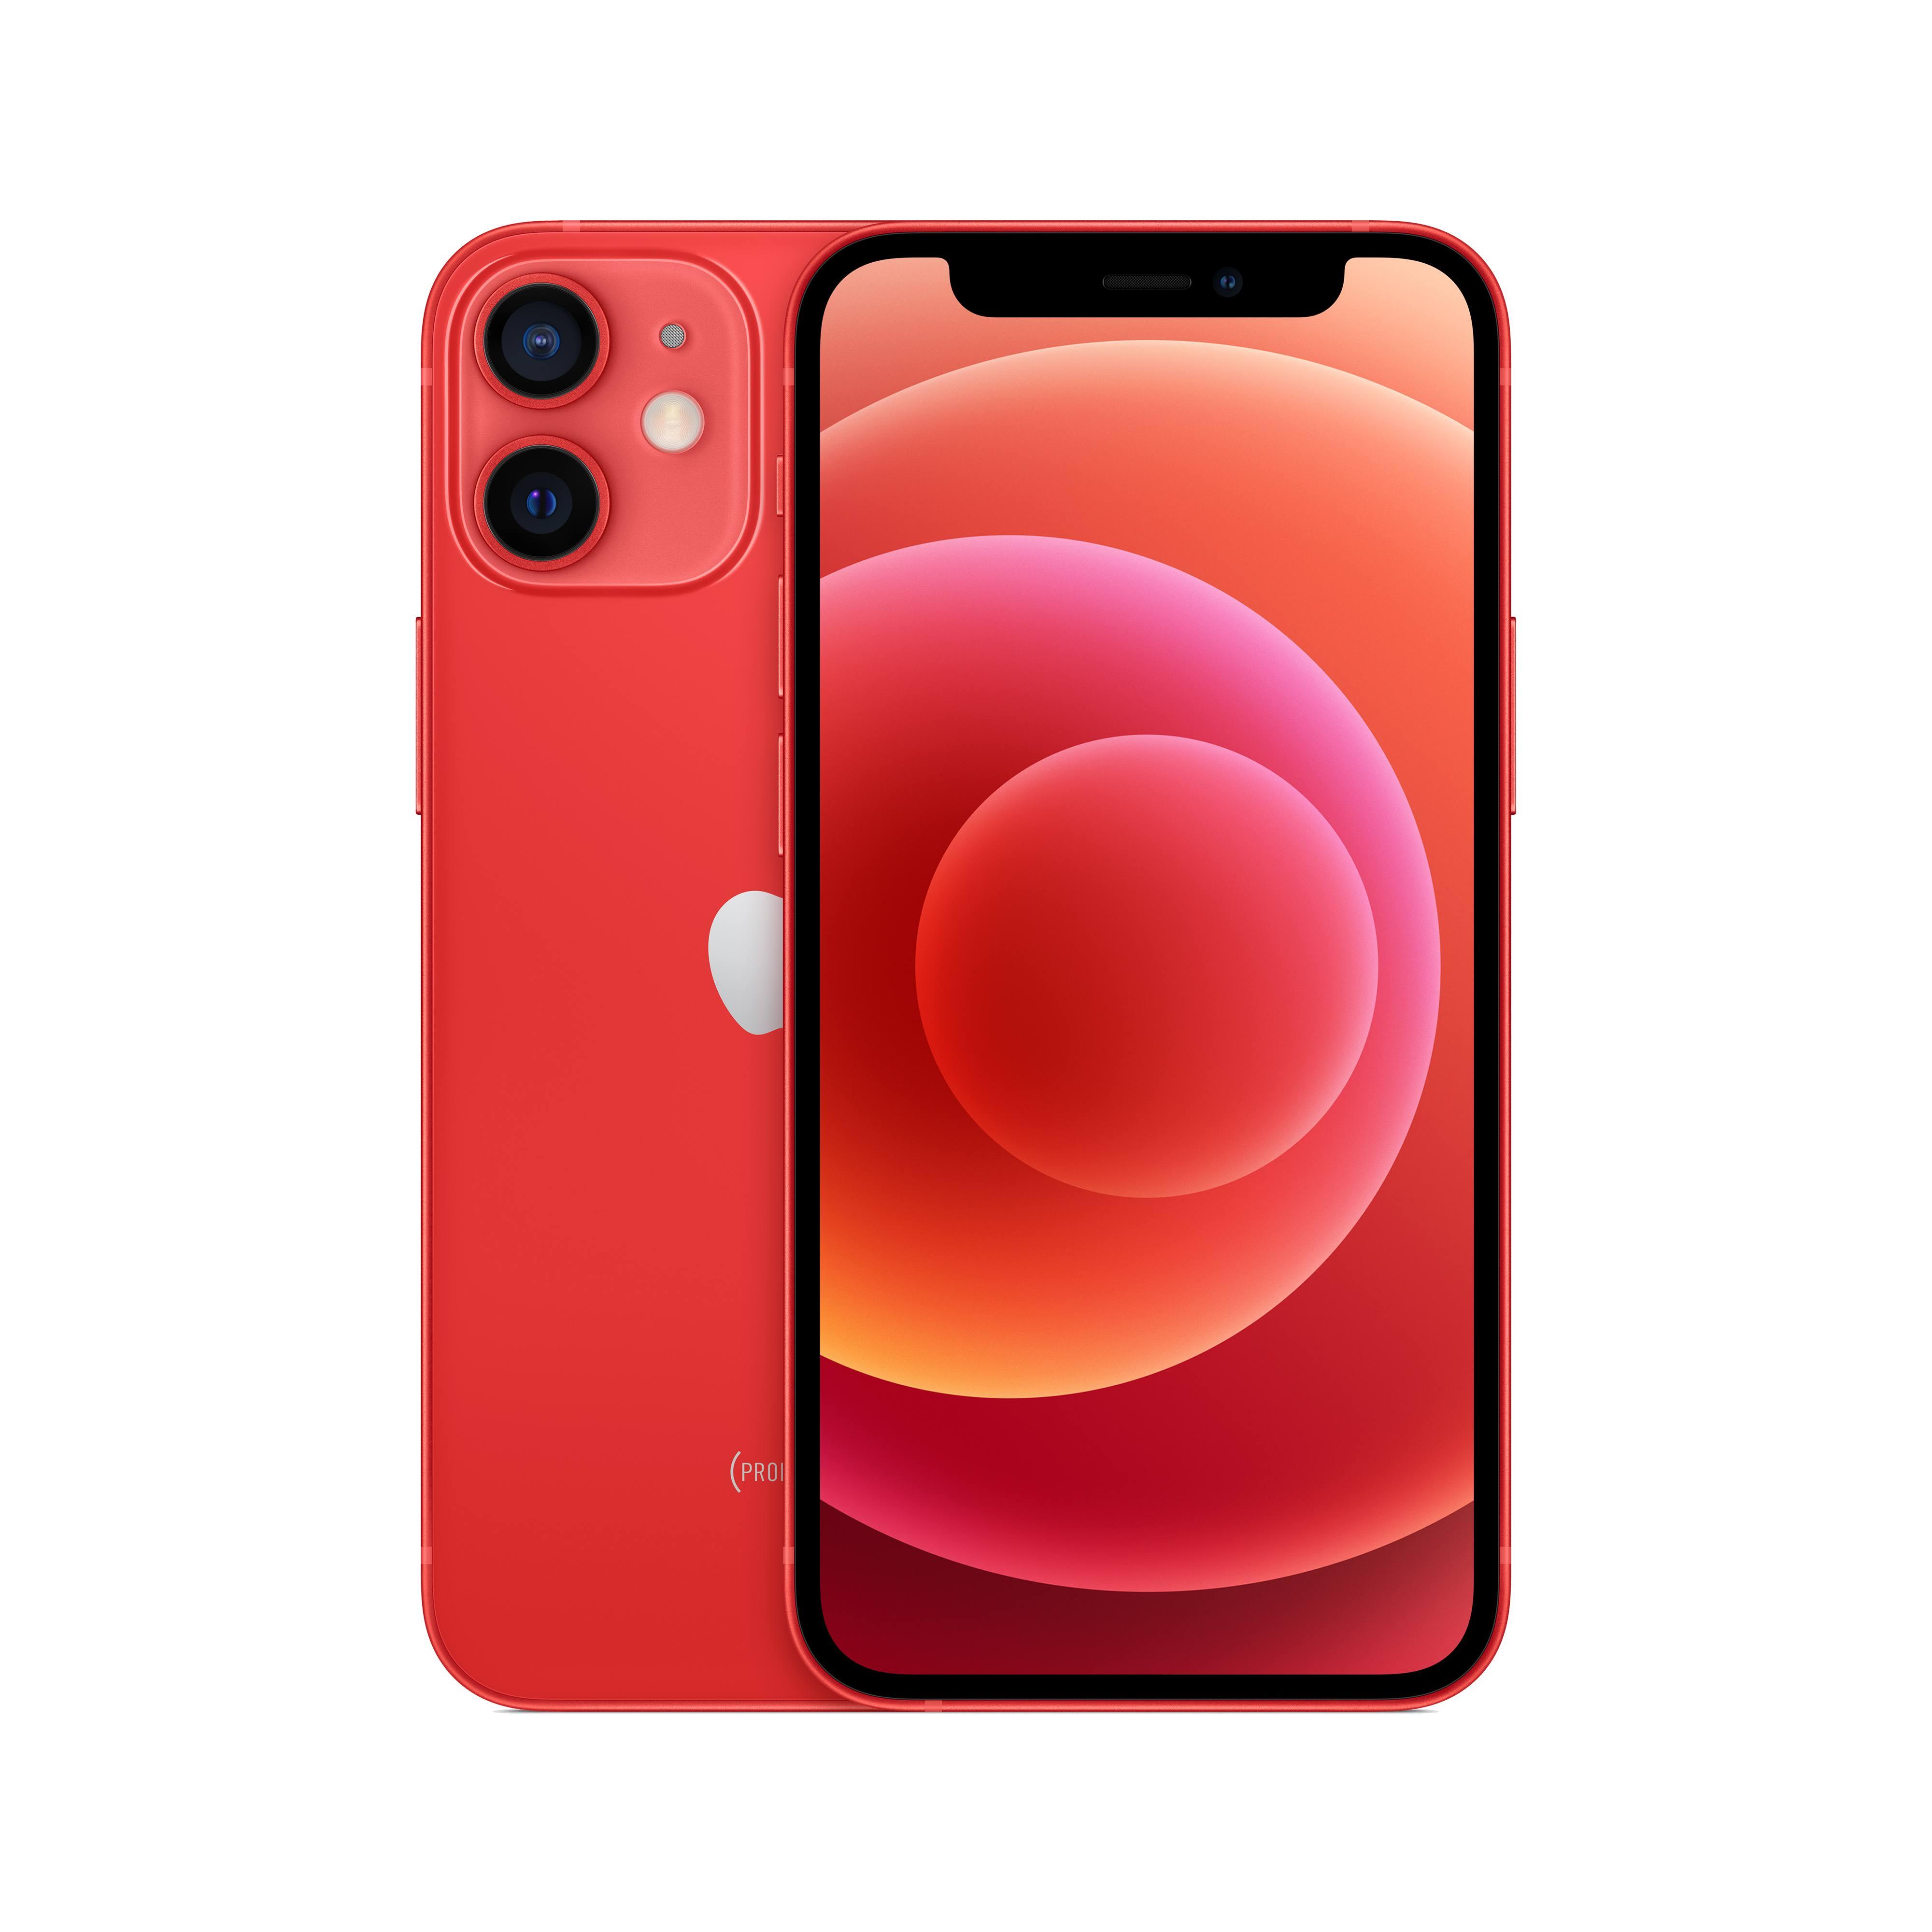 APPLE IPHONE 12 MINI 64 GB (PRODUCT)RED